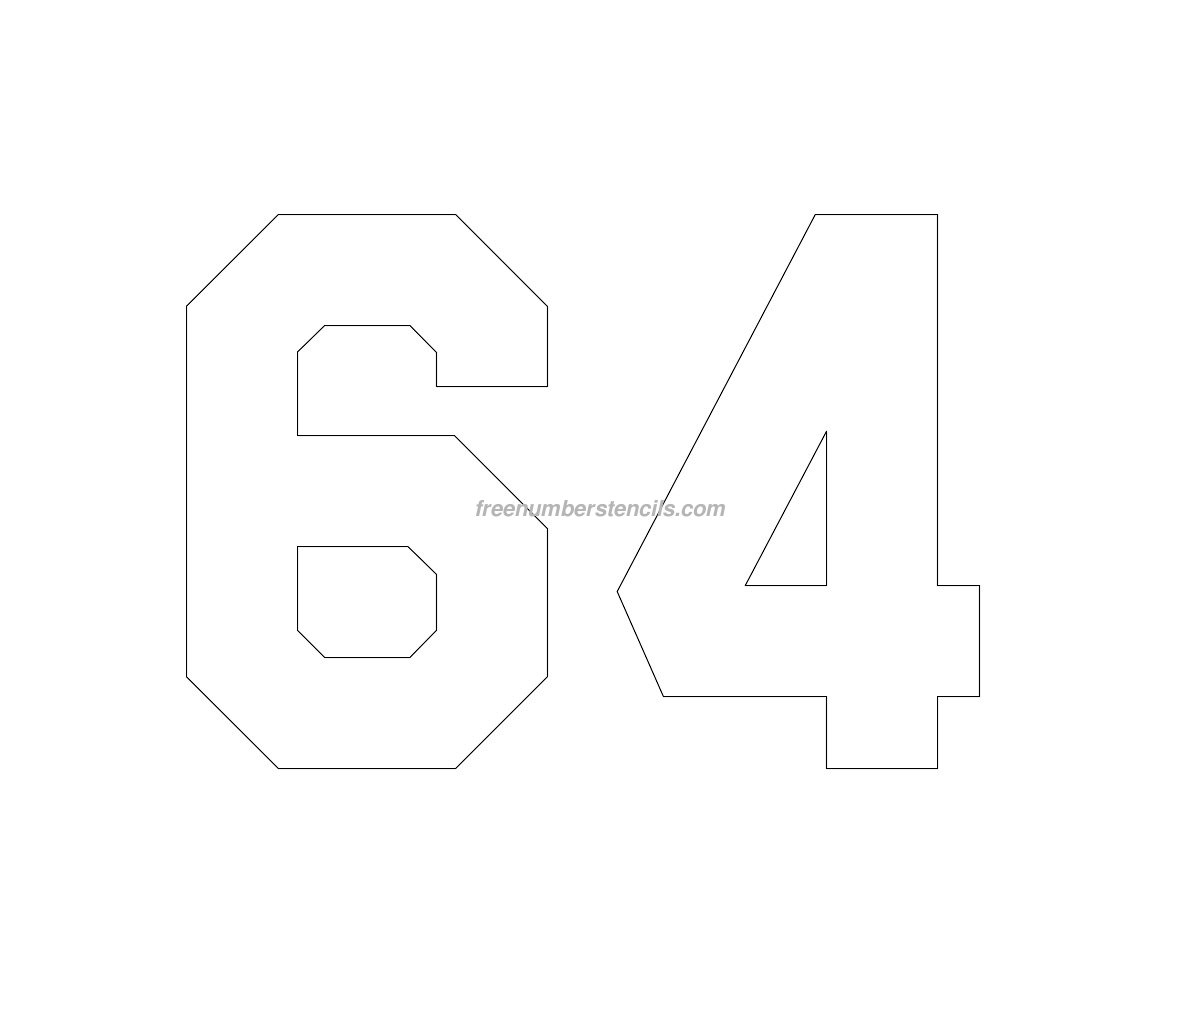 Free Hockey 64 Number Stencil - Freenumberstencils.com